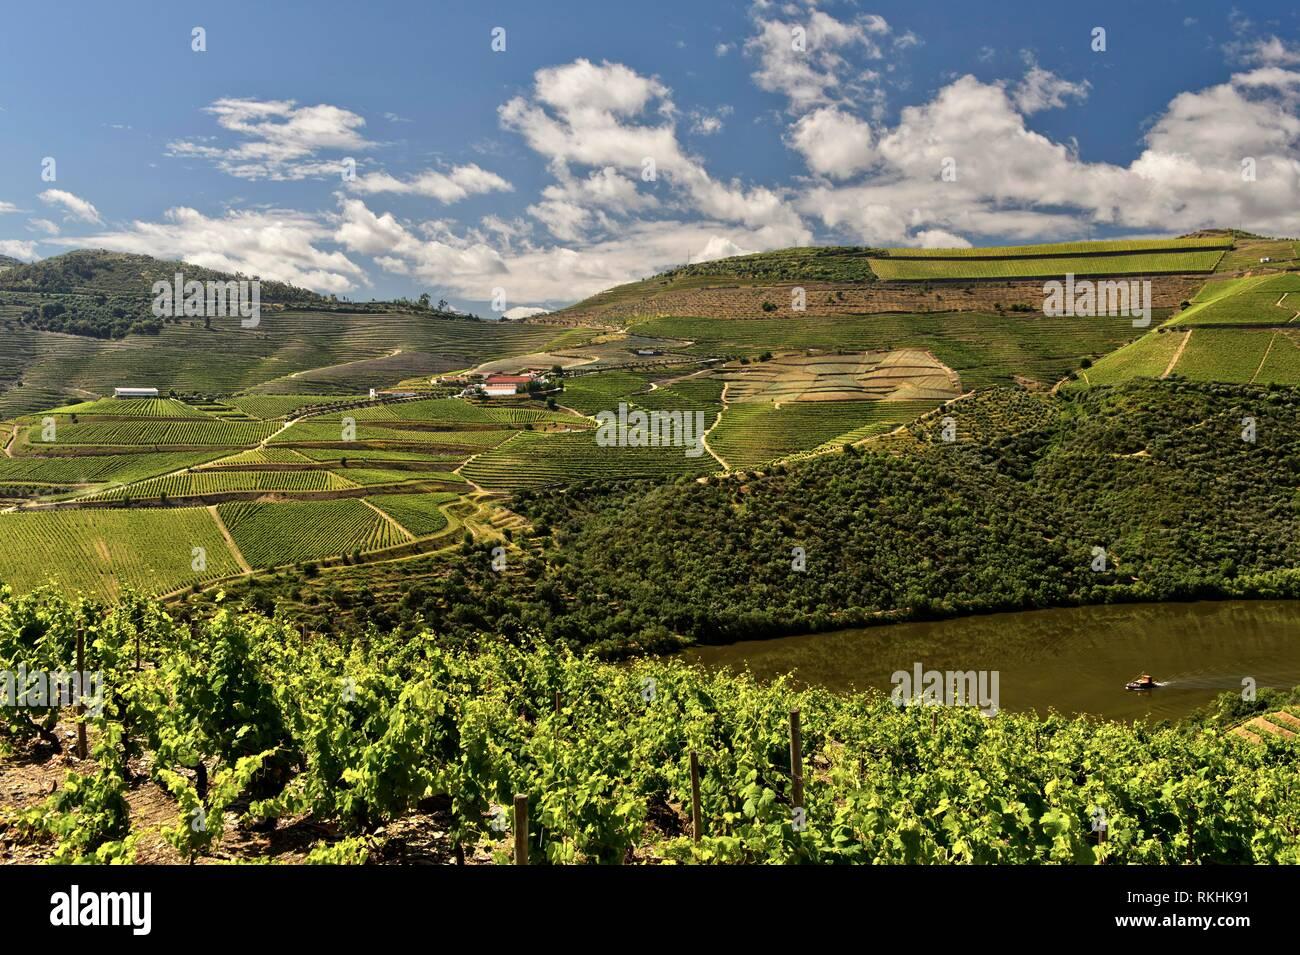 Vineyards in the port wine region Alto Douro, Pinhao, Douro Valley, Portugal - Stock Image